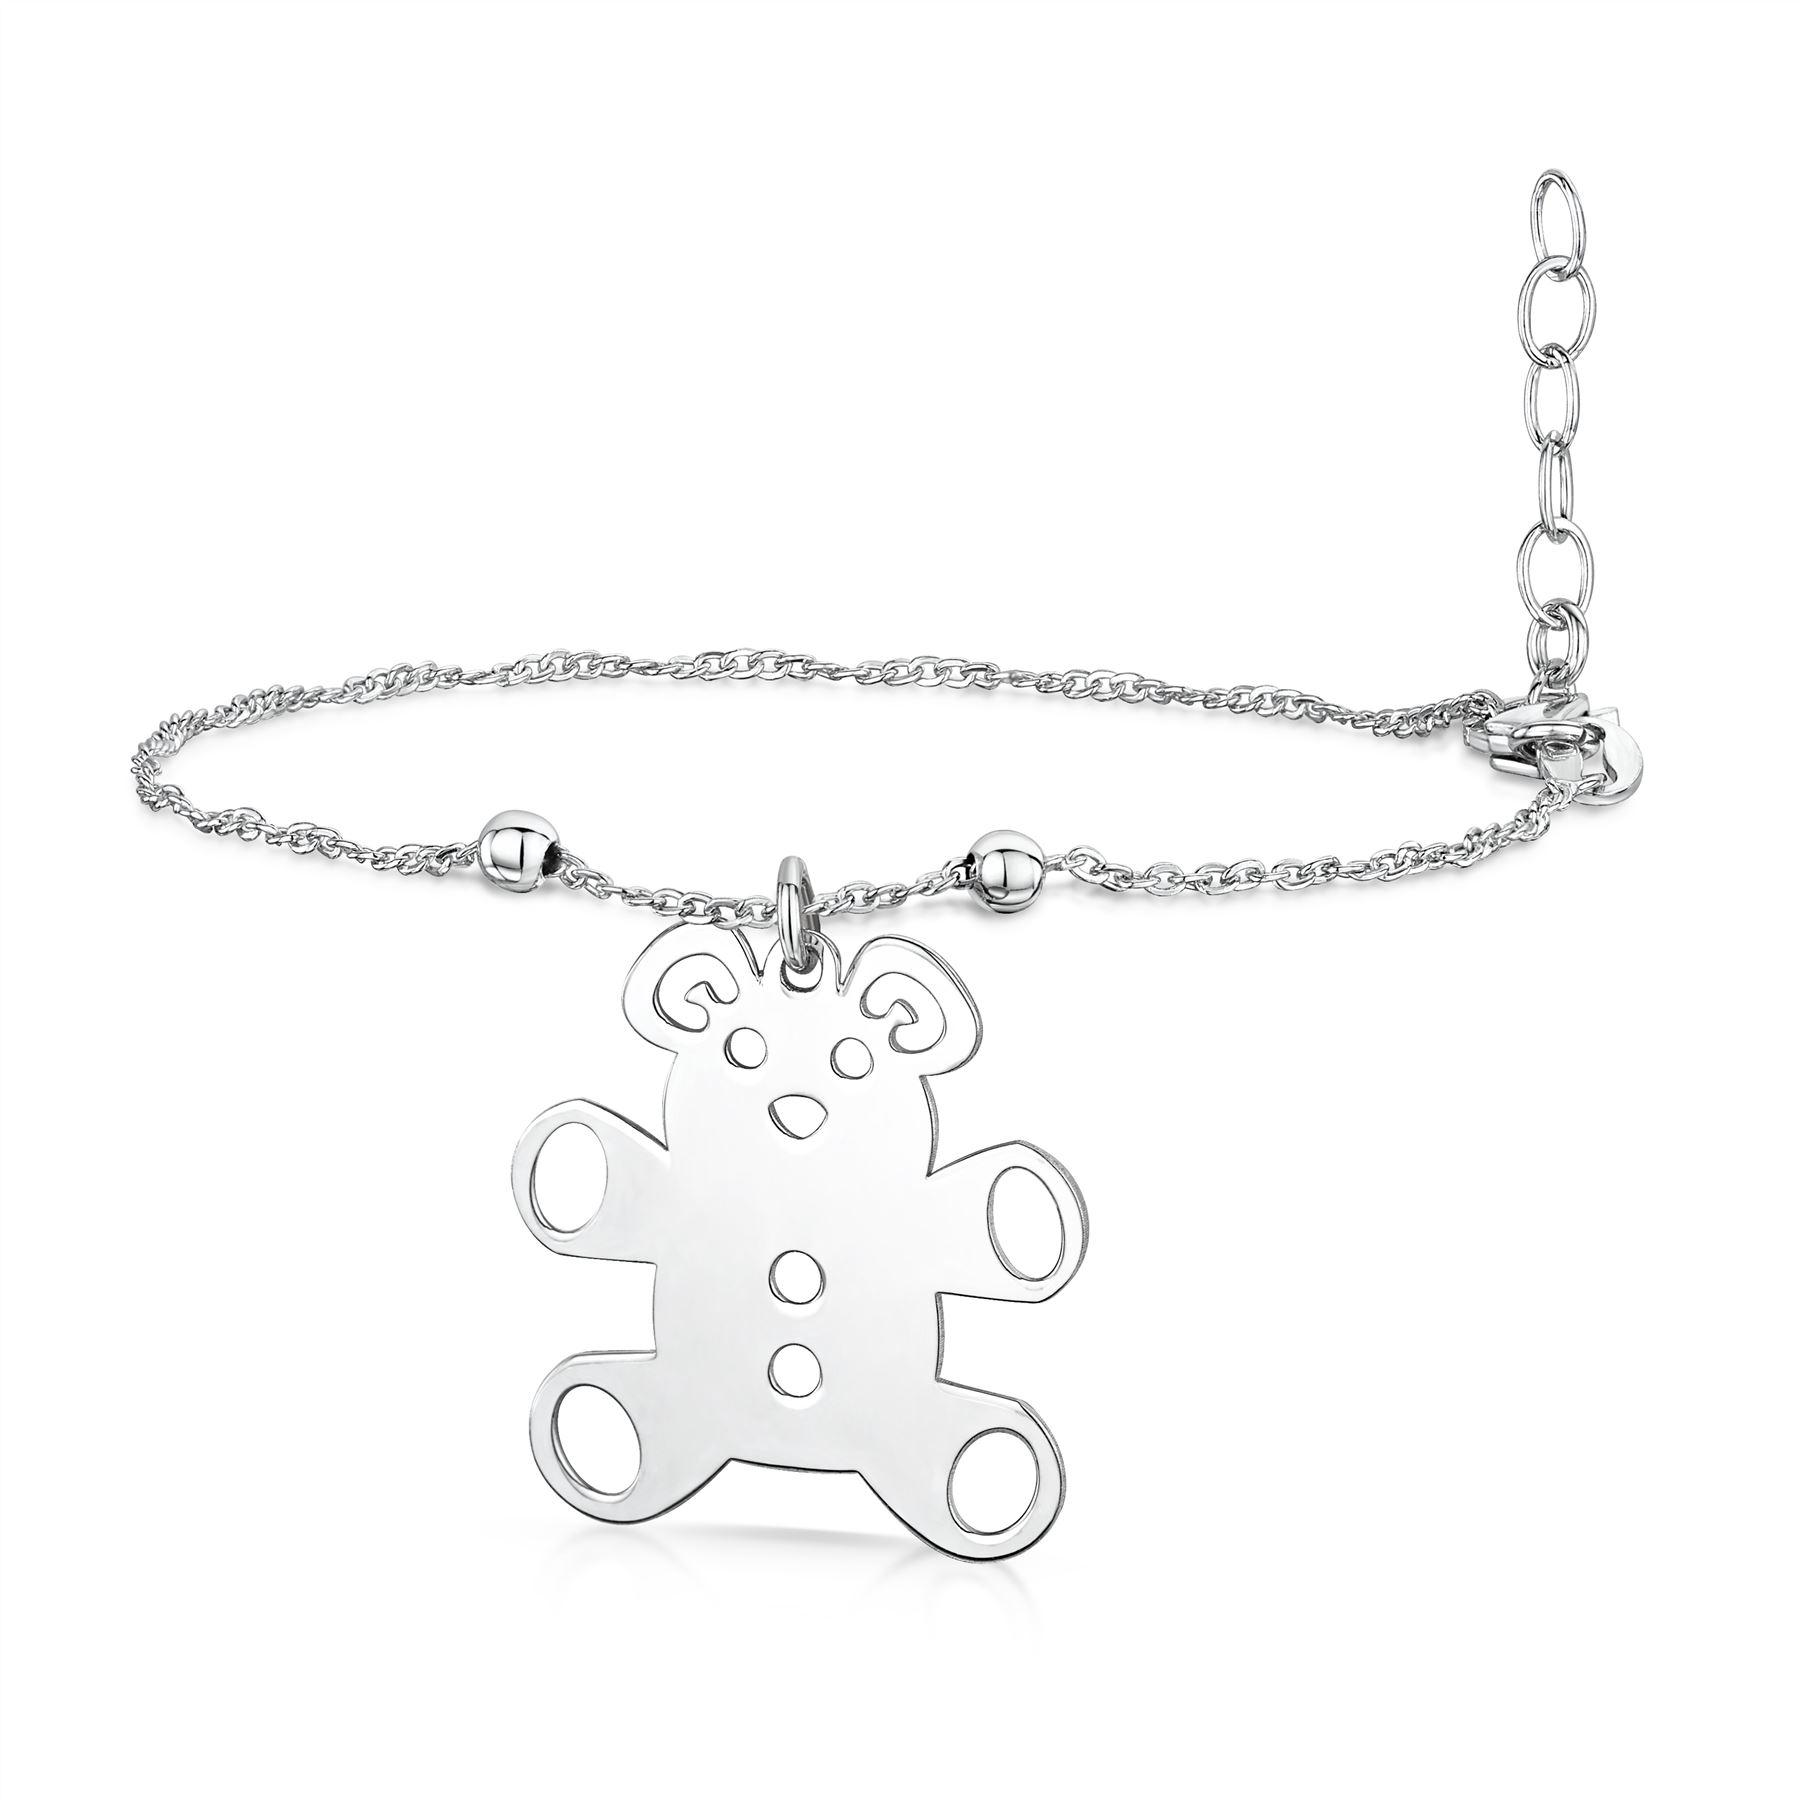 Amberta-Jewelry-925-Sterling-Silver-Adjustable-Bracelet-Italian-Bangle-for-Women thumbnail 33